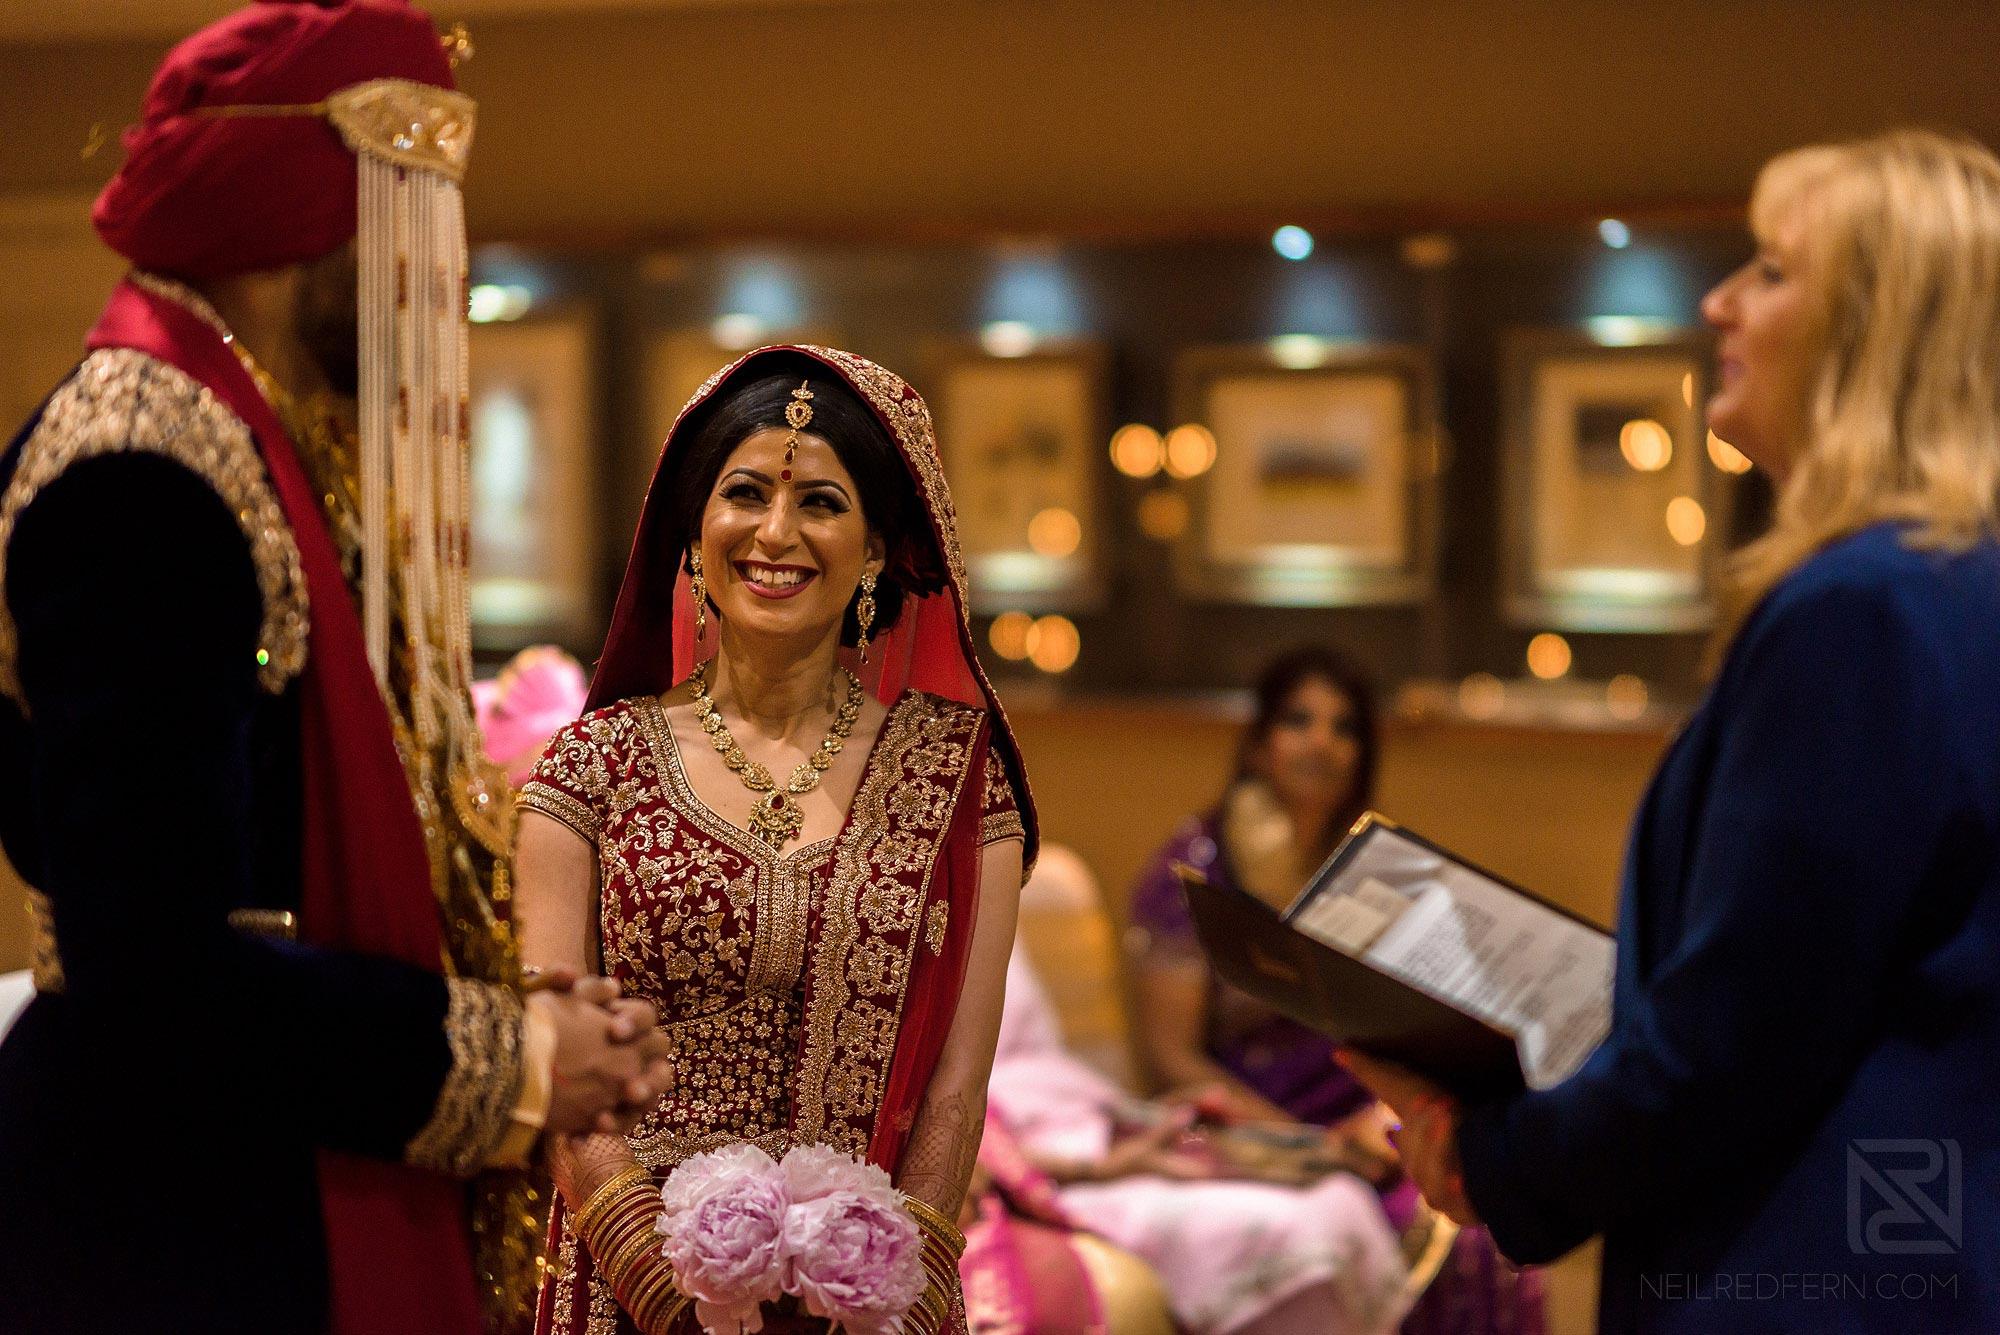 bride looking at groom during wedding ceremony